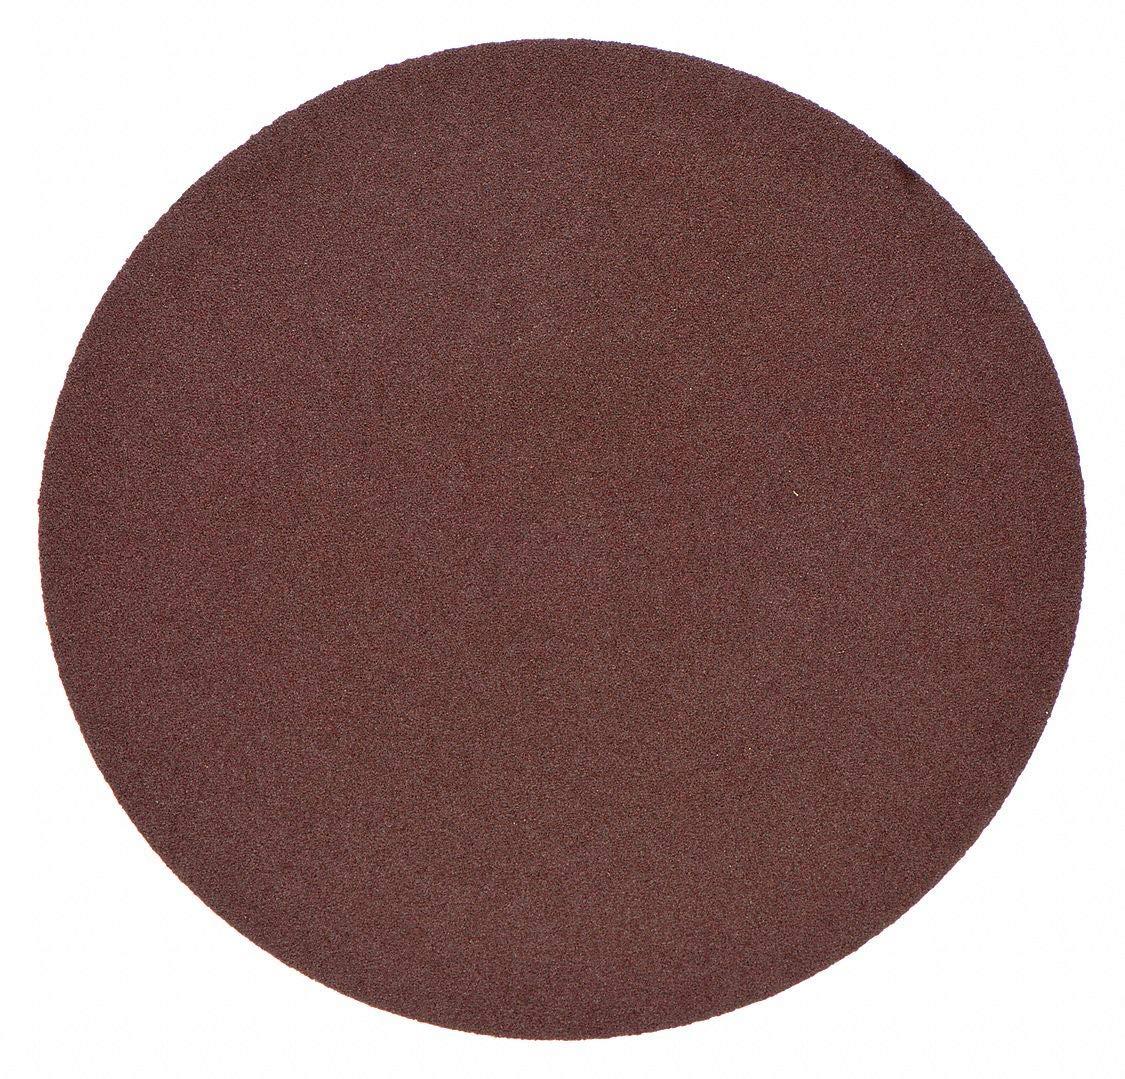 PSA Sanding Disc, AlO, Cloth, 3in, 100 Grit